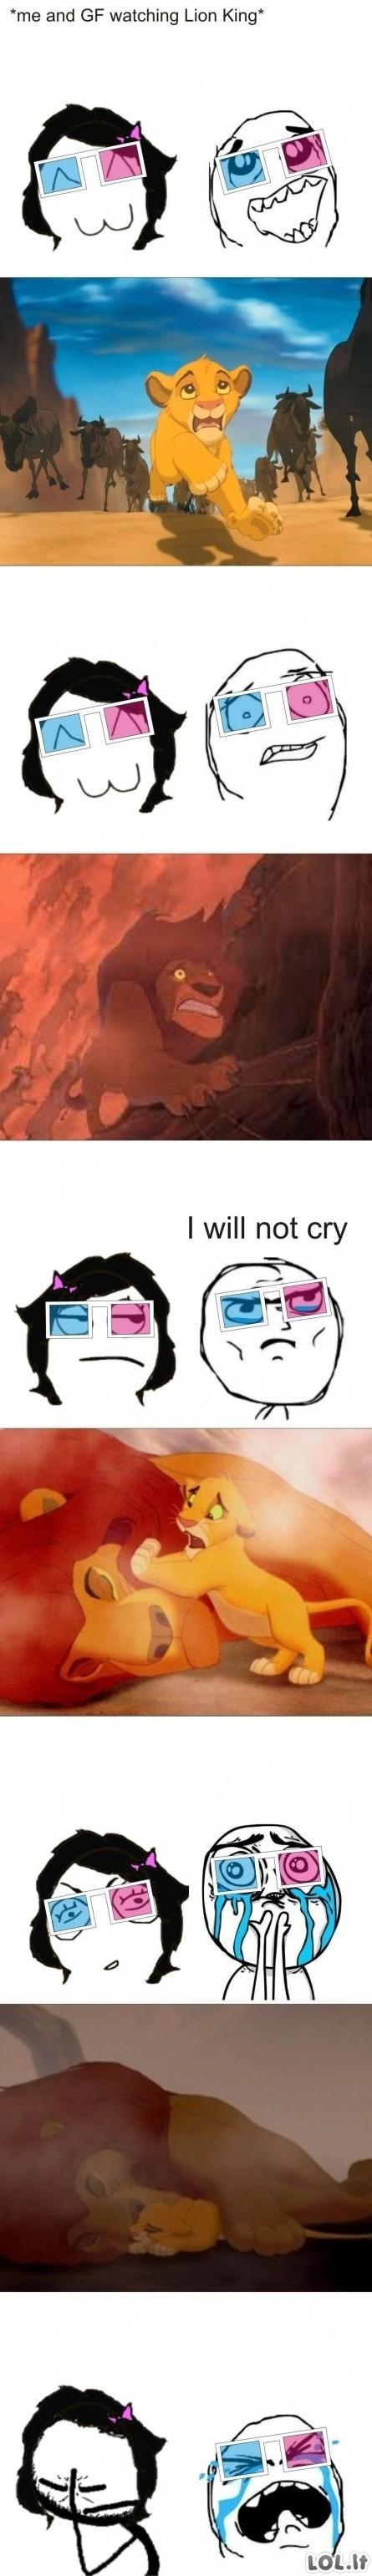 Liūdnoka scena